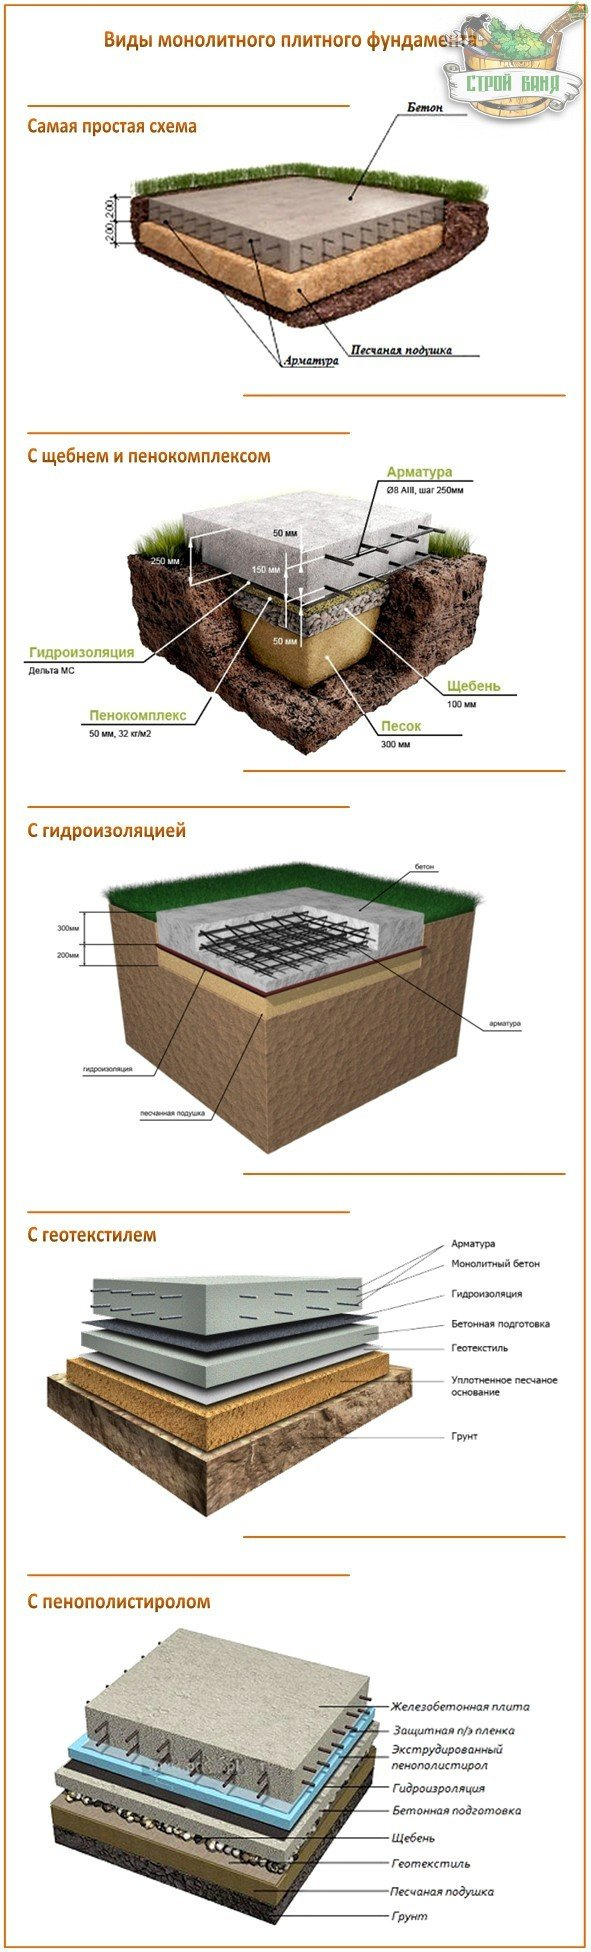 Виды плитного монолитного фундамента